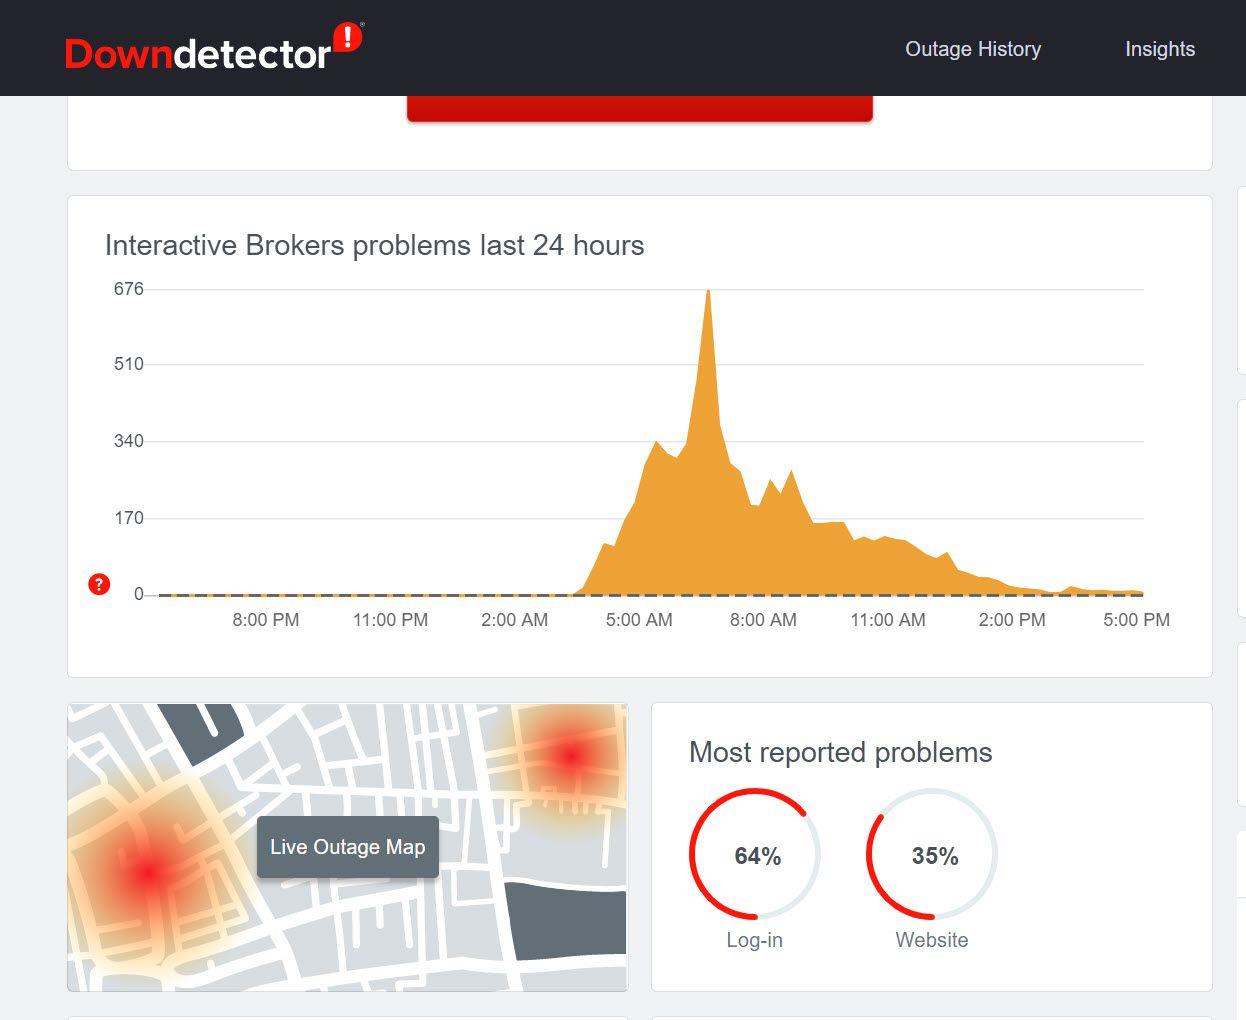 IBKR Downdetector history 12/7/2020